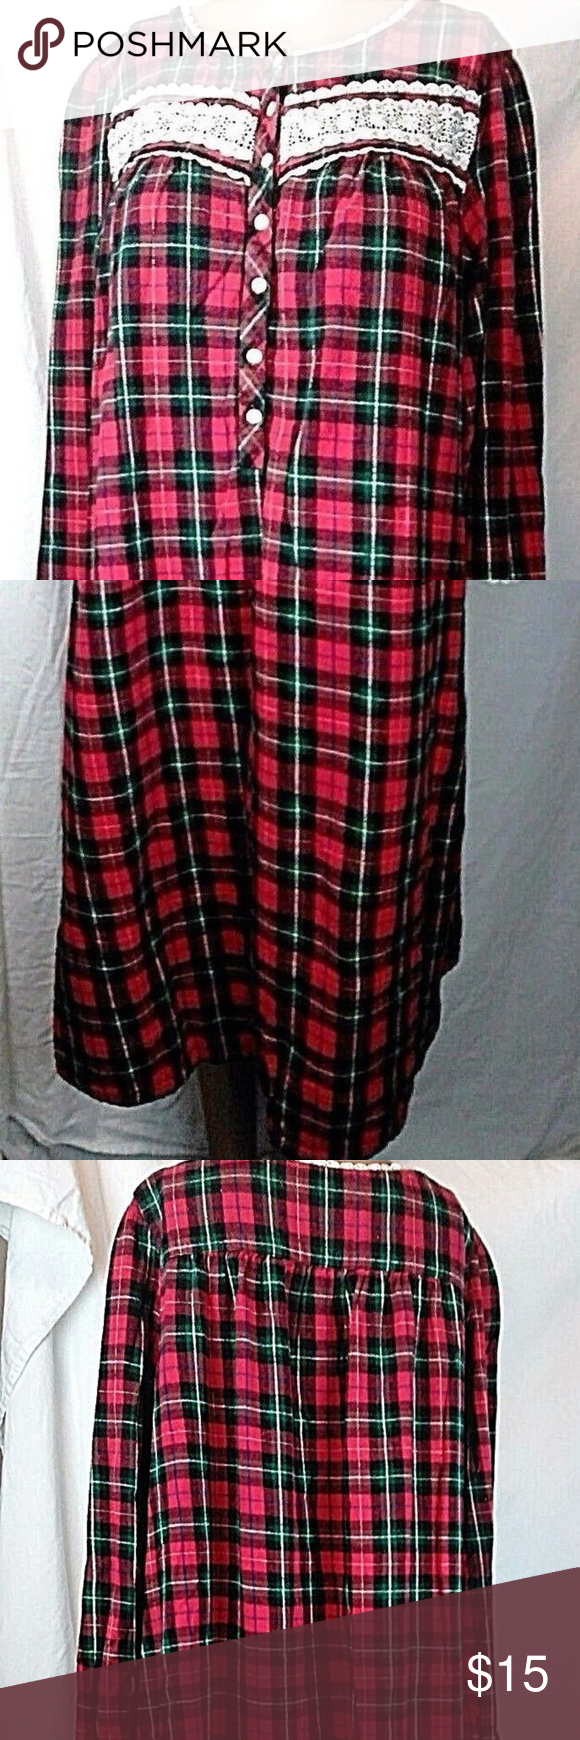 Red flannel nightgown  Croft u Barrow Intimates Plaid Flannel Nightgown M  My Posh Closet